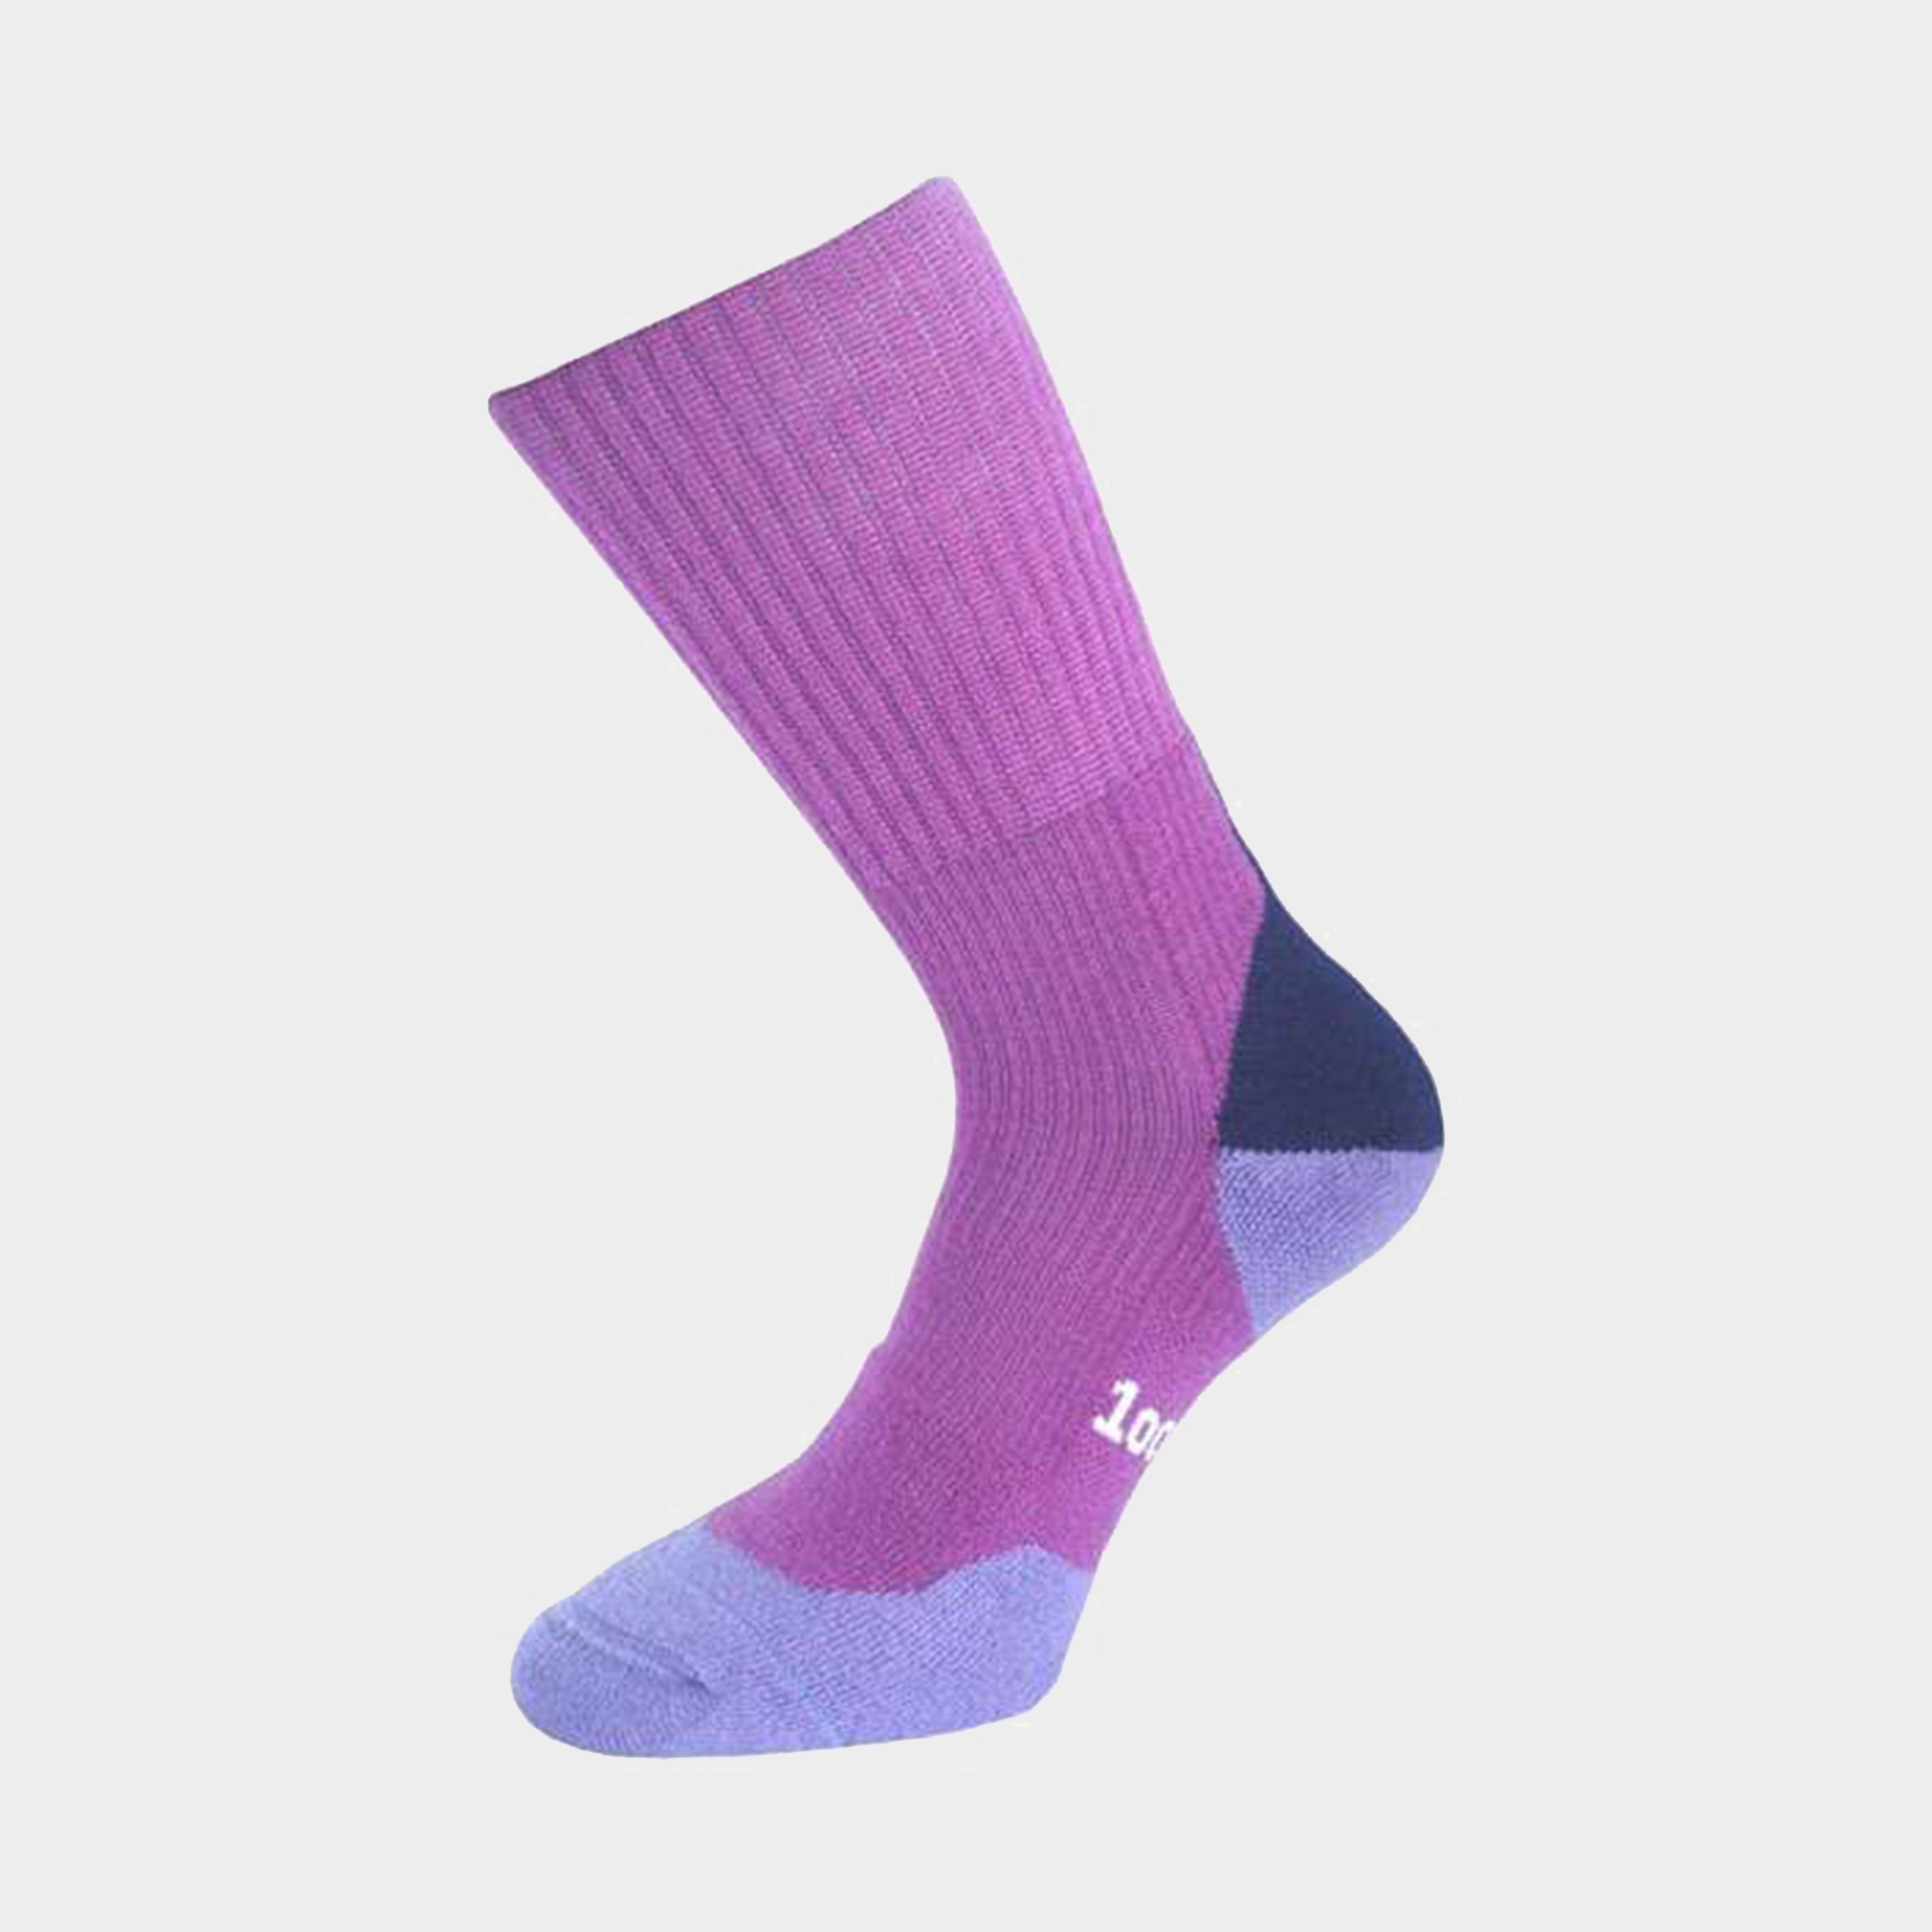 1000 Mile Womens Fusion Walking Socks - Grape/grape  Grape/grape